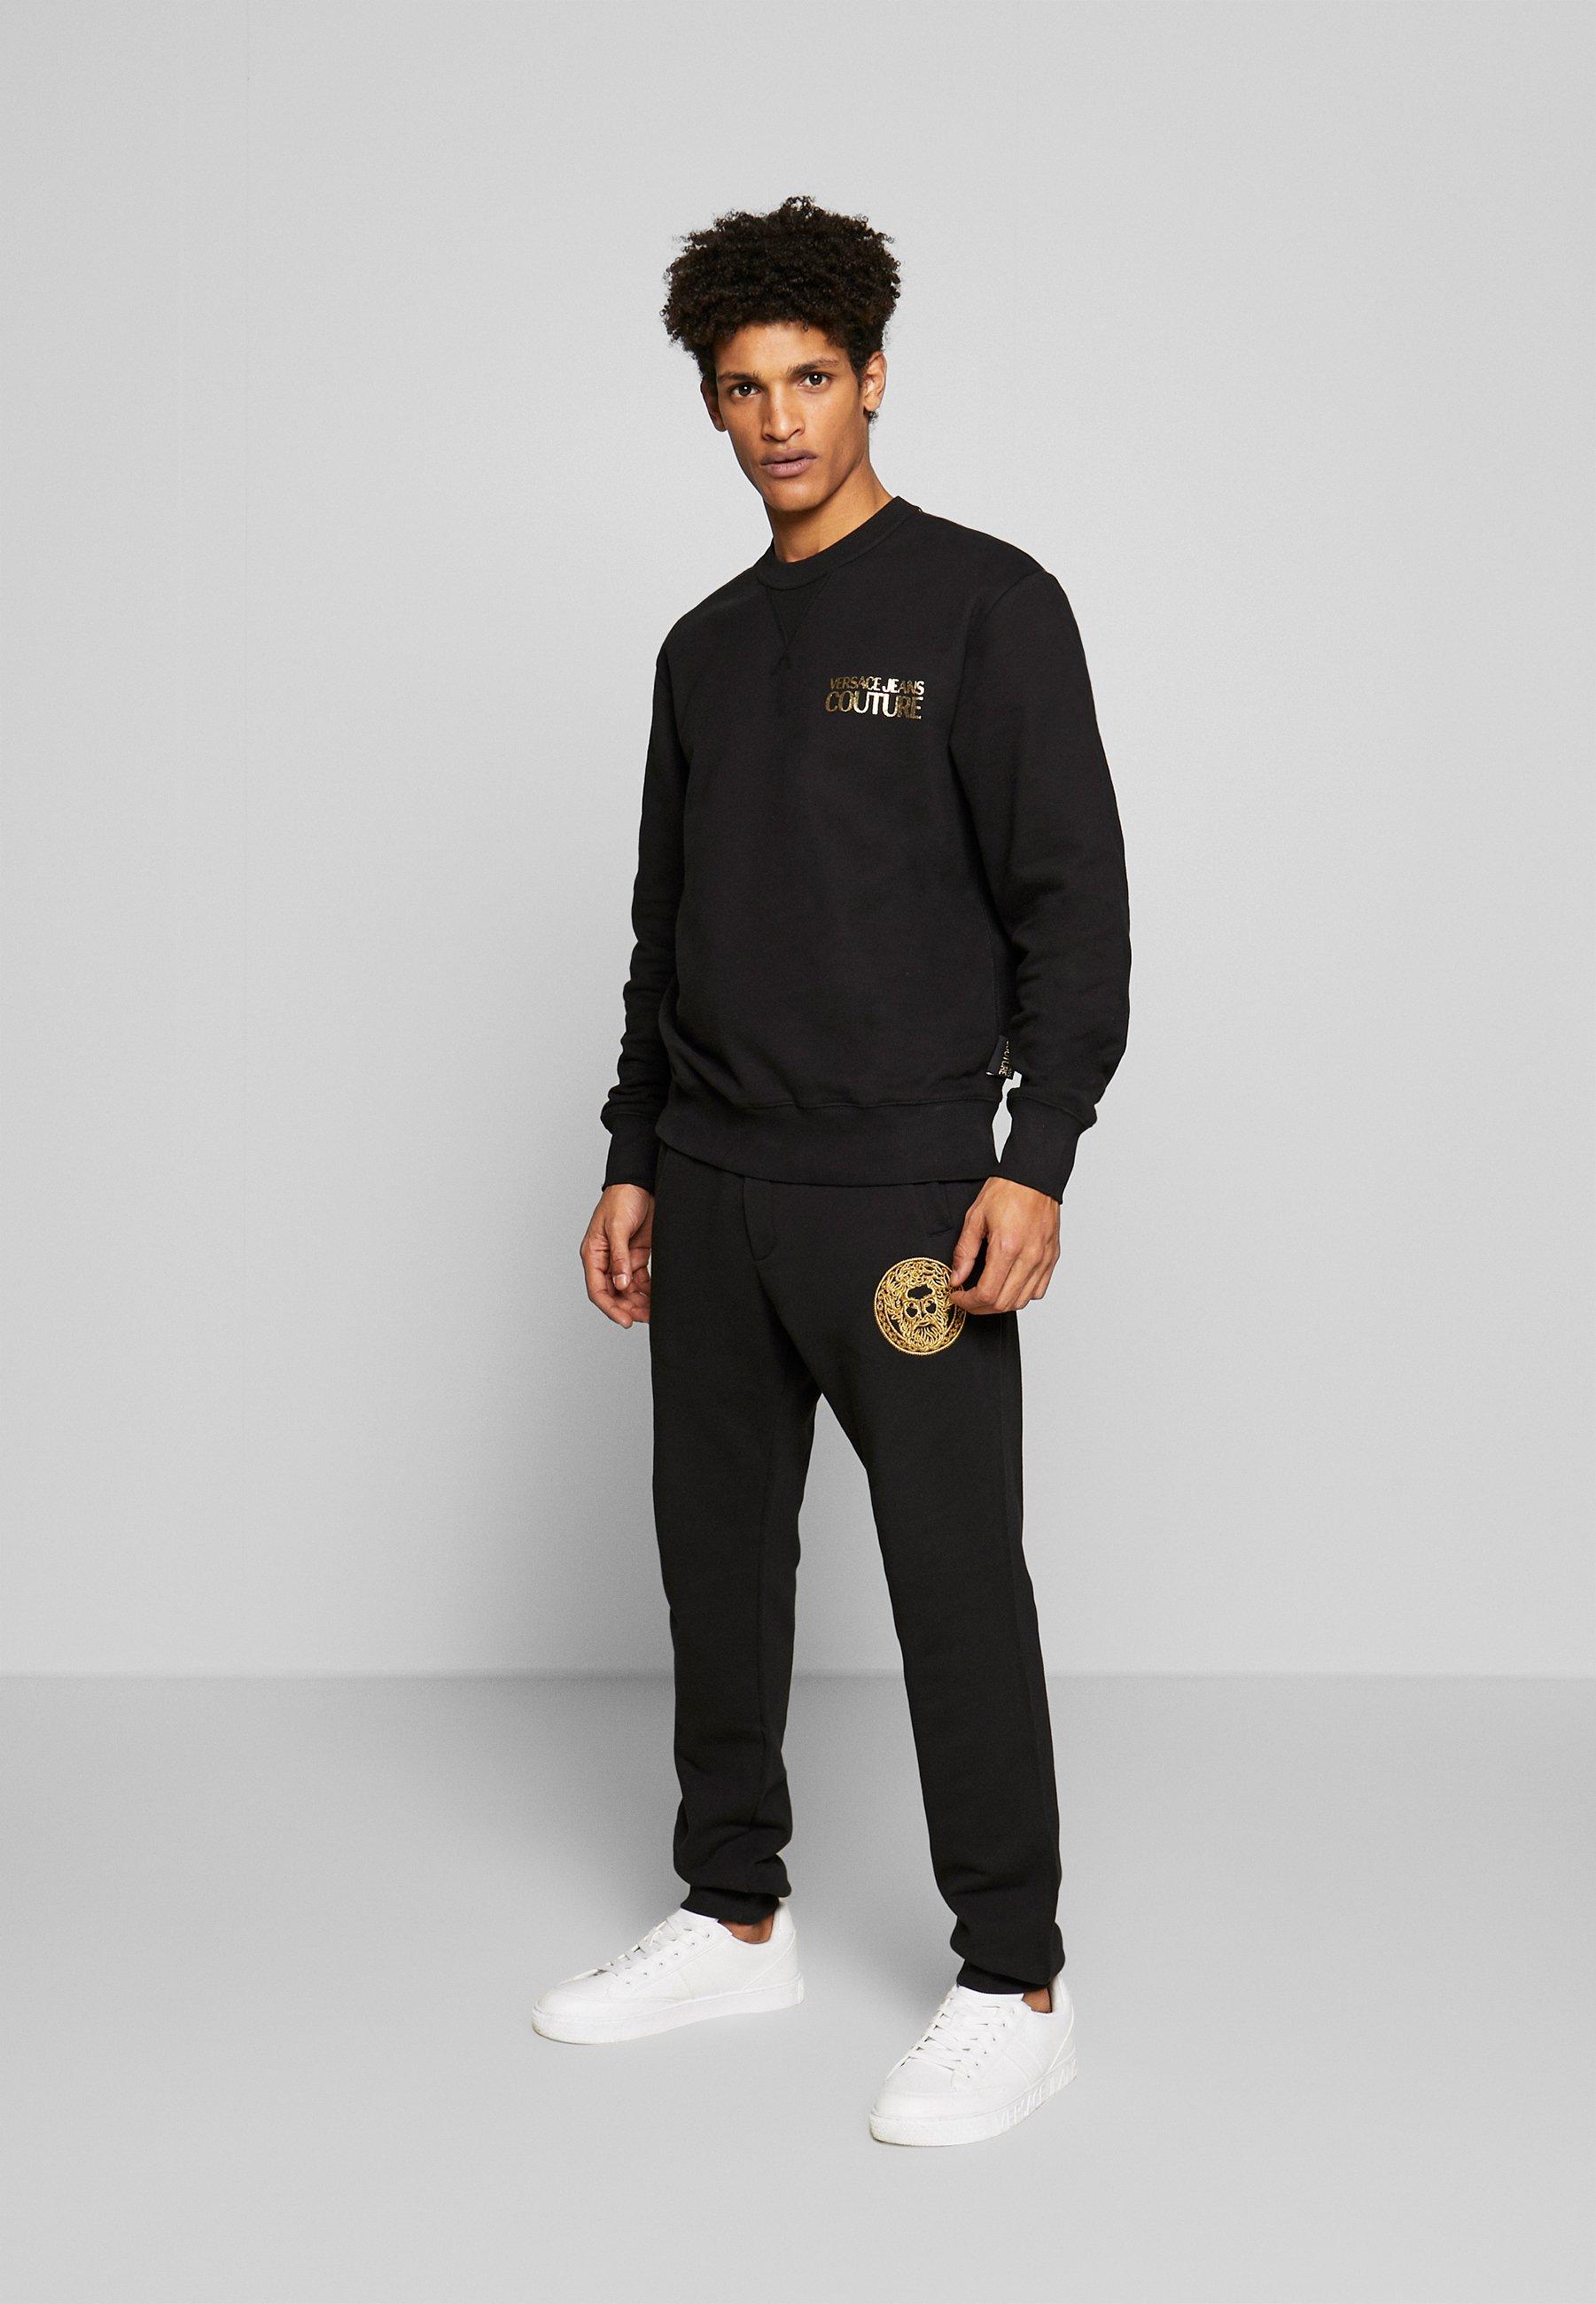 Versace Jeans Couture Crew Chest Logo - Sweatshirt Black yUTVtSS